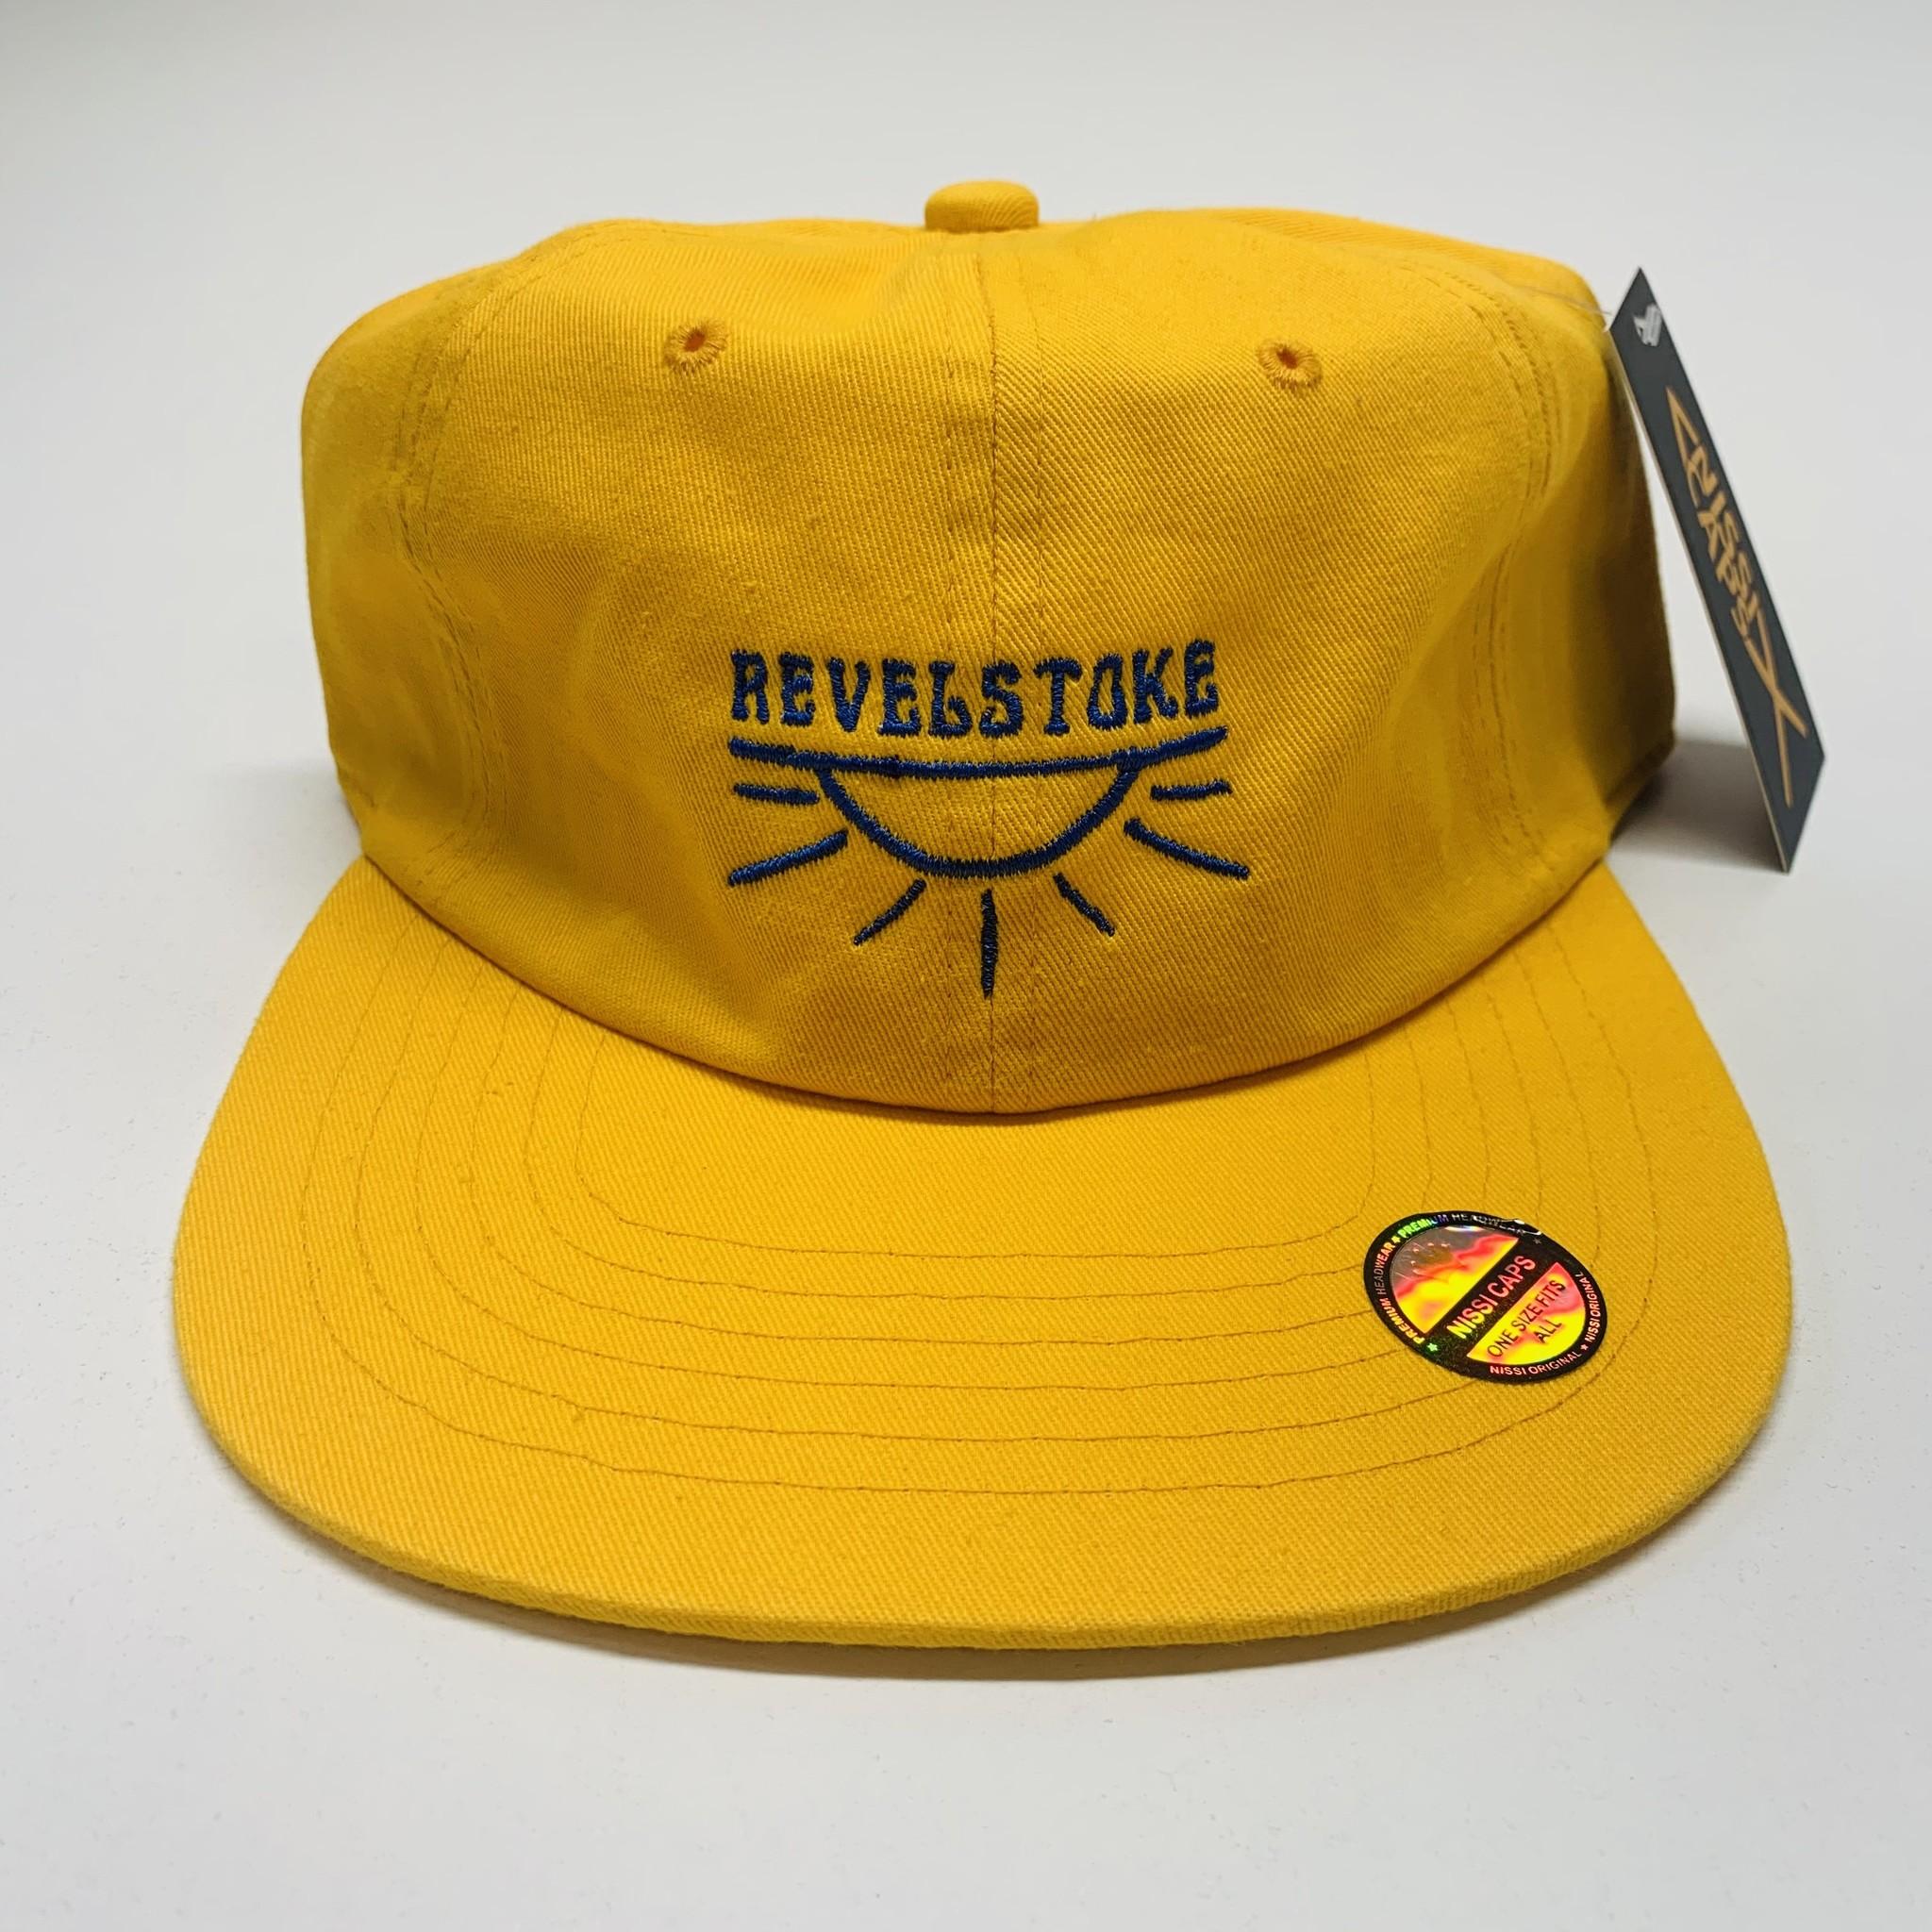 Trading Co. Revelstoke - Over Easy Cap (Yellow)